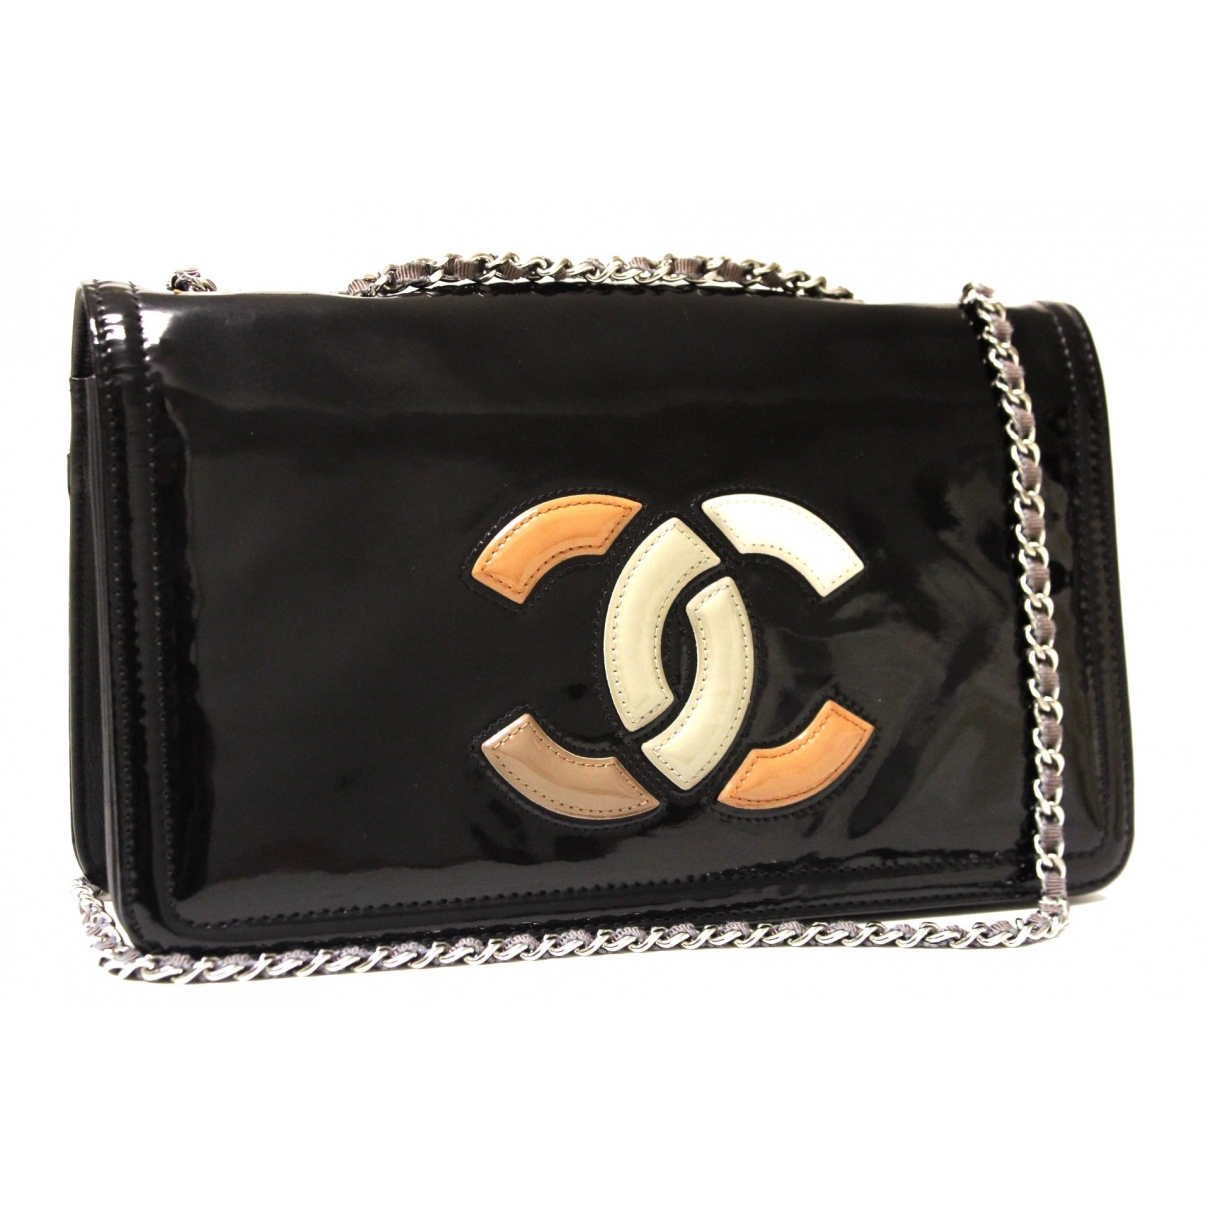 Chanel \N Black Clutch bag for Women \N